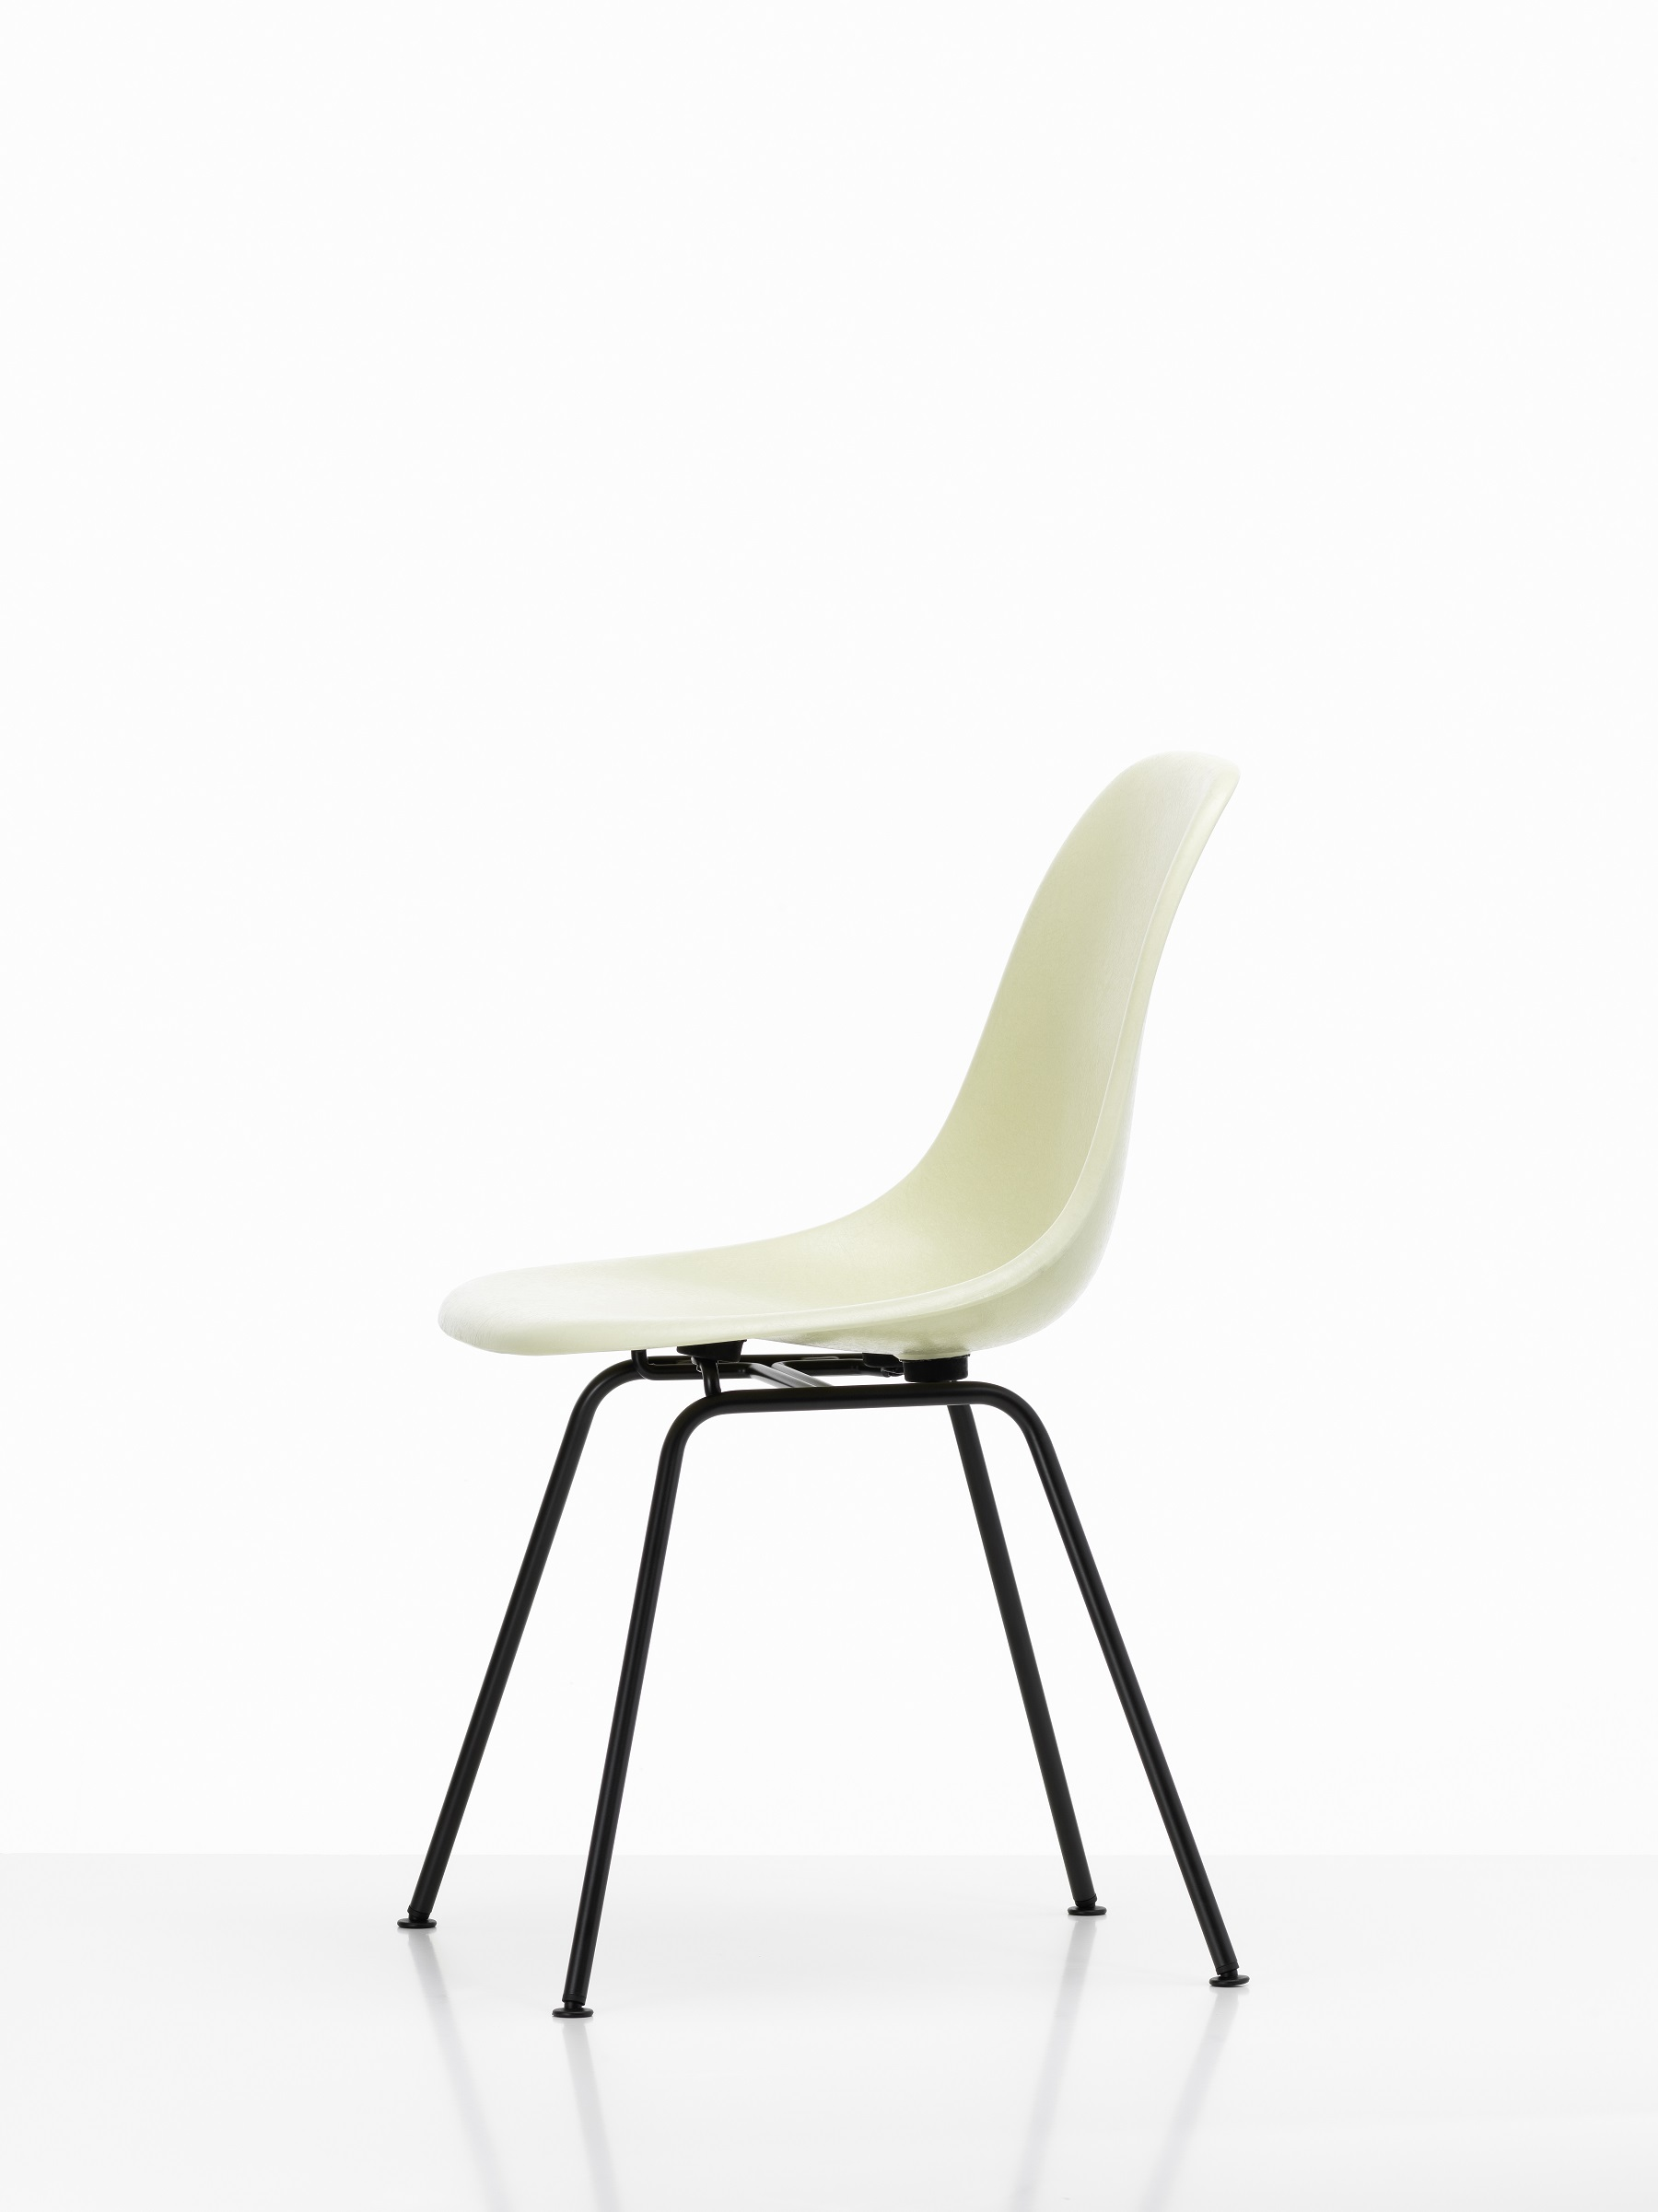 Vitra Eames Fiberglass Side Chair Dsx Charles Und Ray Eames Designikonen Designmobel Shop